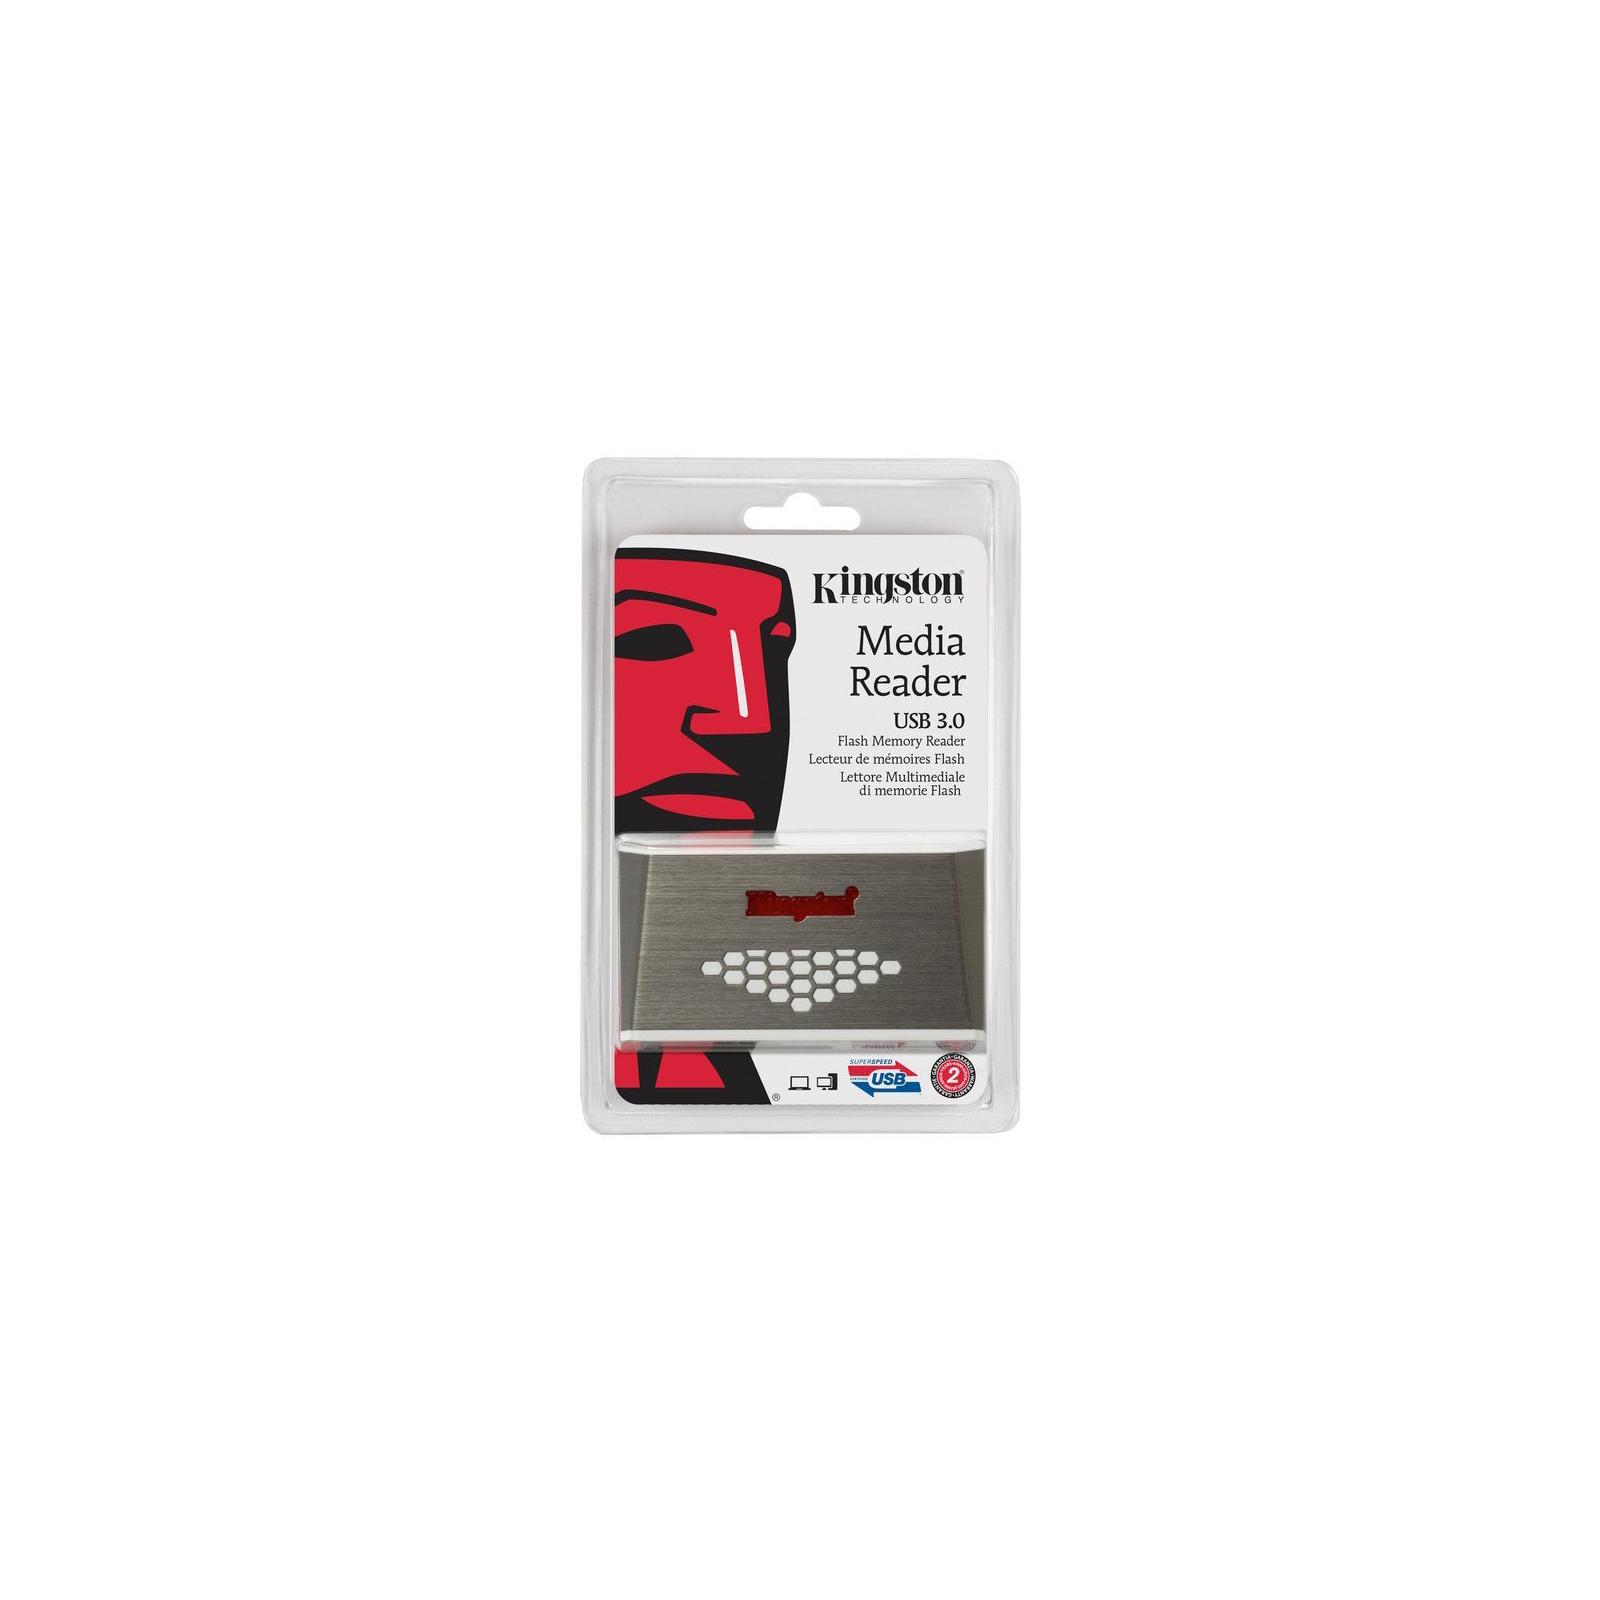 Resultado de imagen para kingston high-speed media reader lector de tarjetas - externo